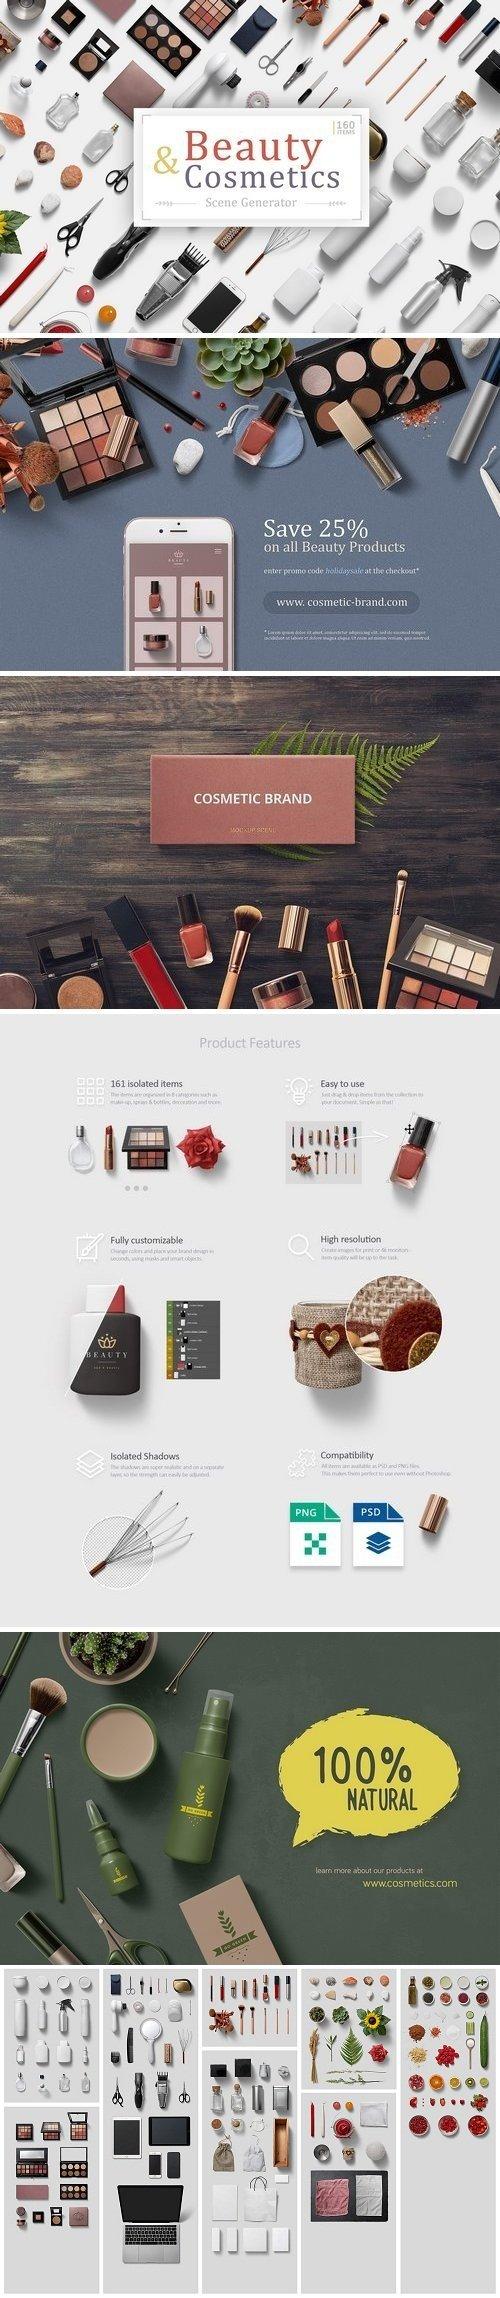 Beauty & Cosmetics Scene Generator 3369239